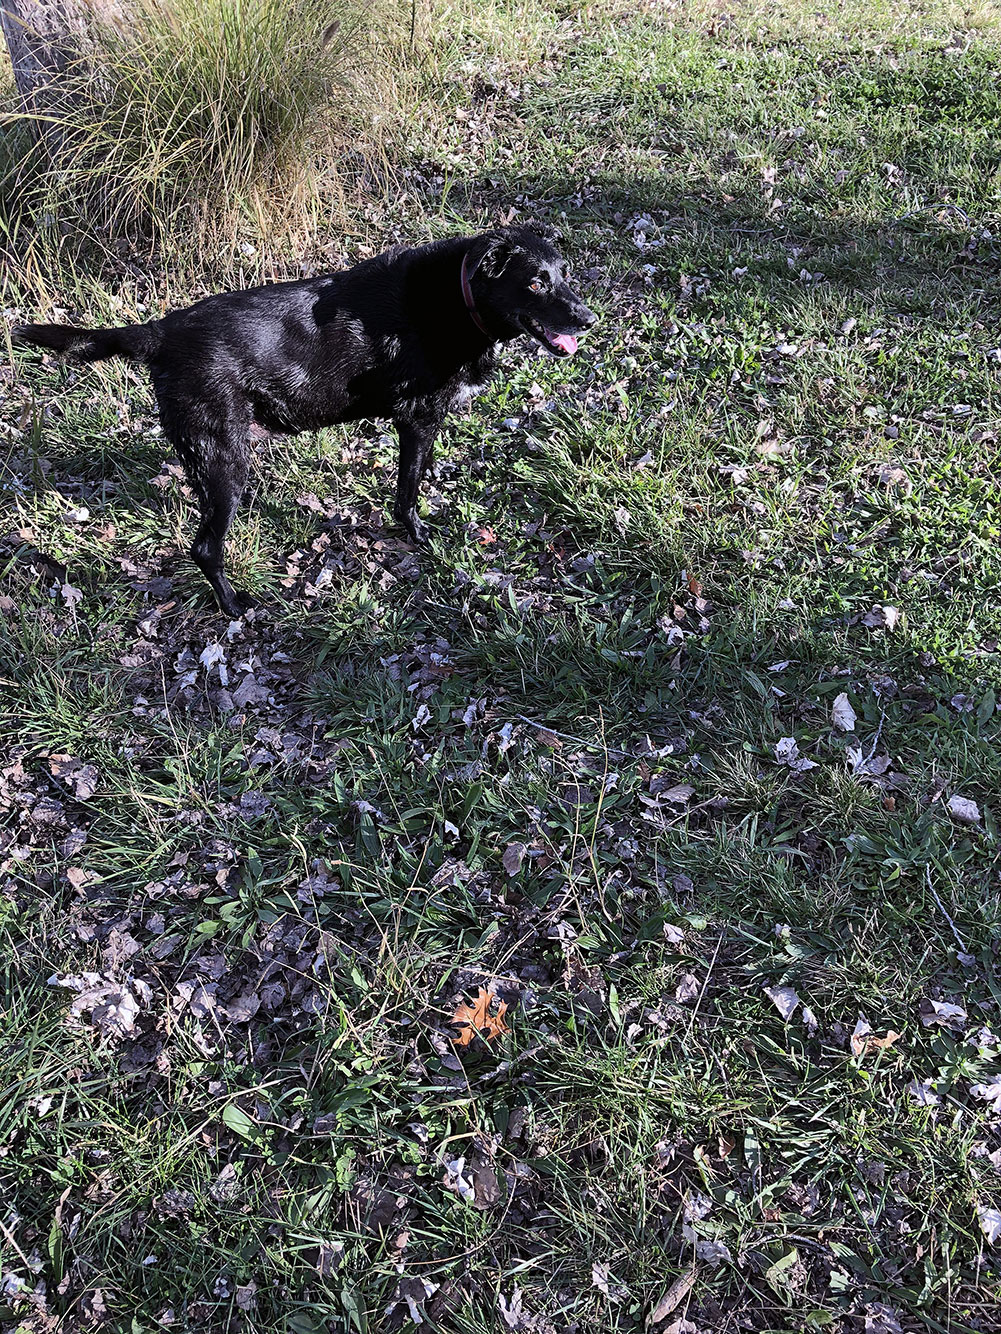 Darcy the superdog